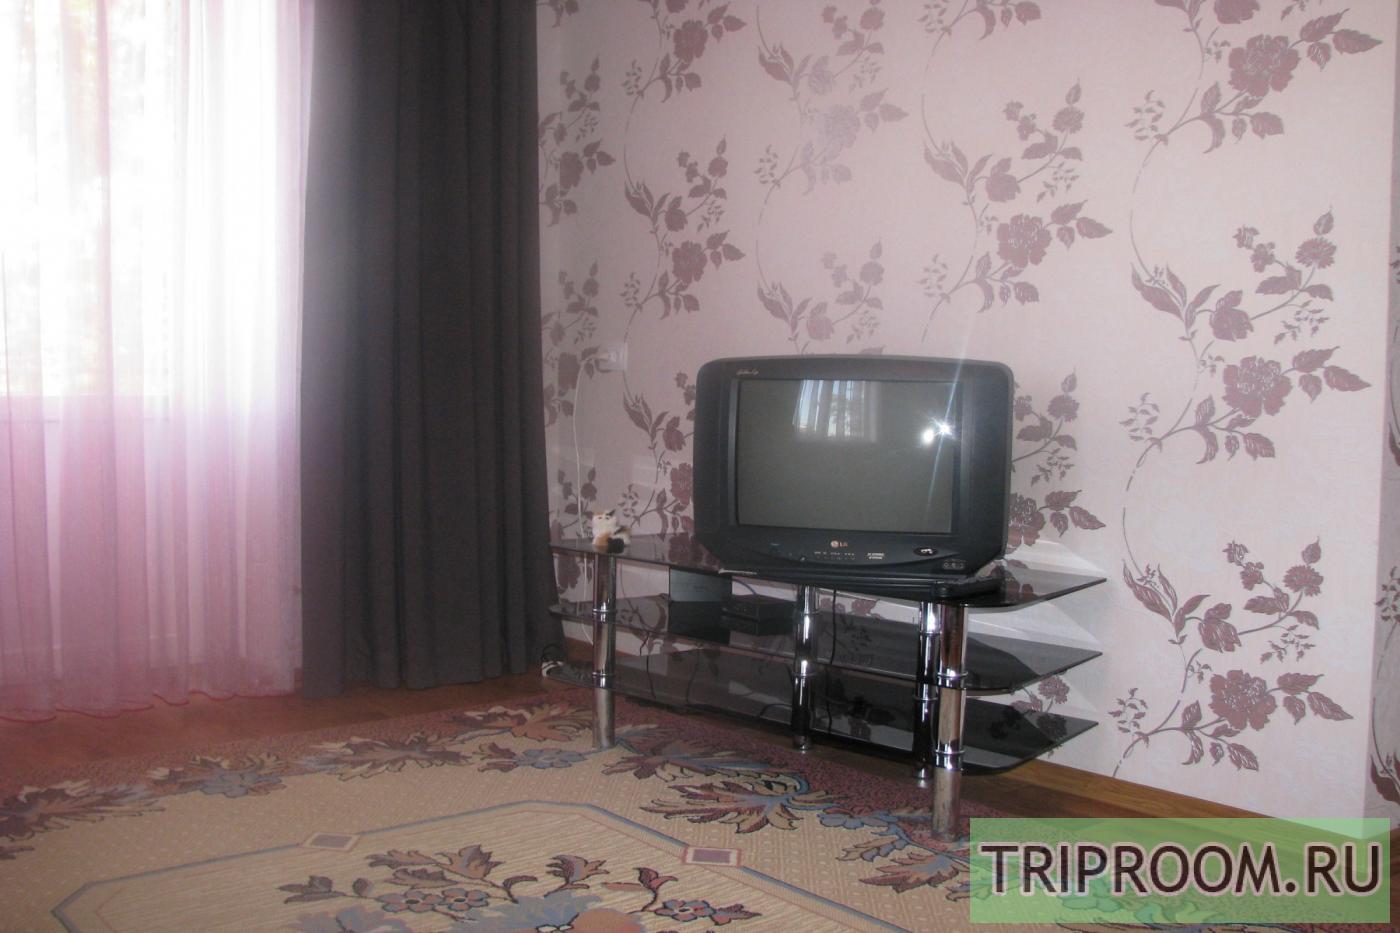 1-комнатная квартира посуточно (вариант № 15422), ул. Кожанова улица, фото № 3